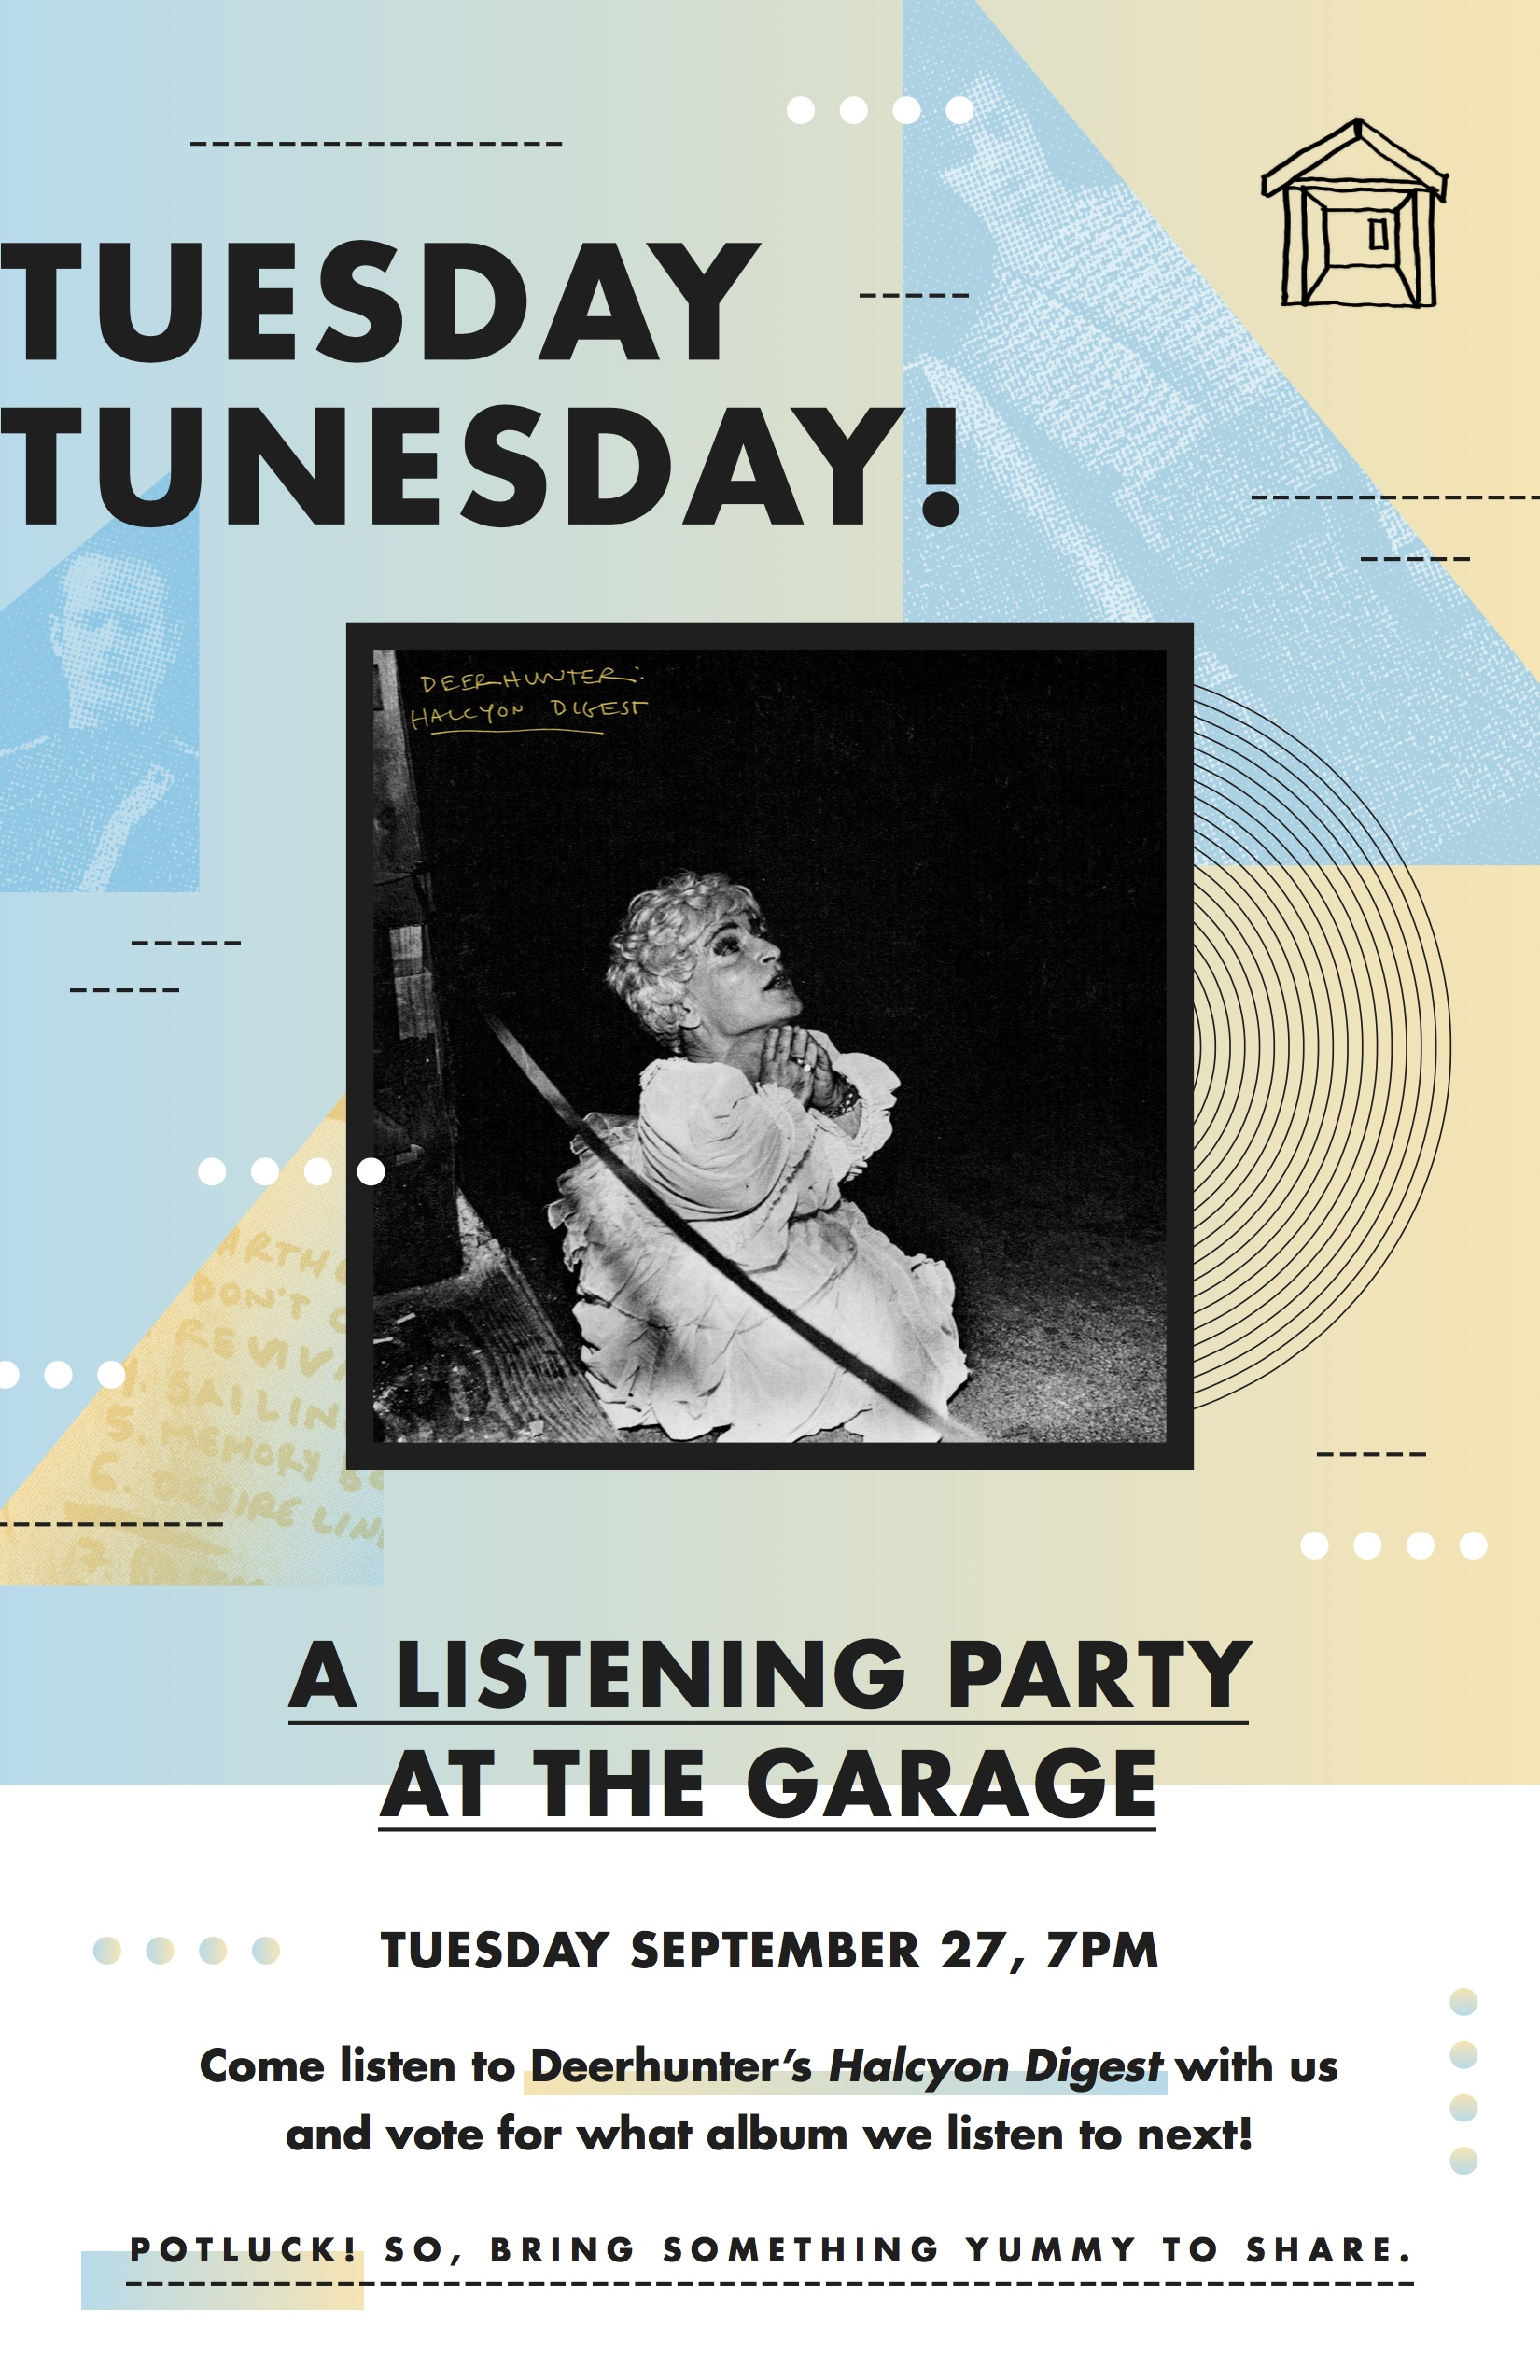 Garage-Deerhunter-Tunesday-01-3.jpg